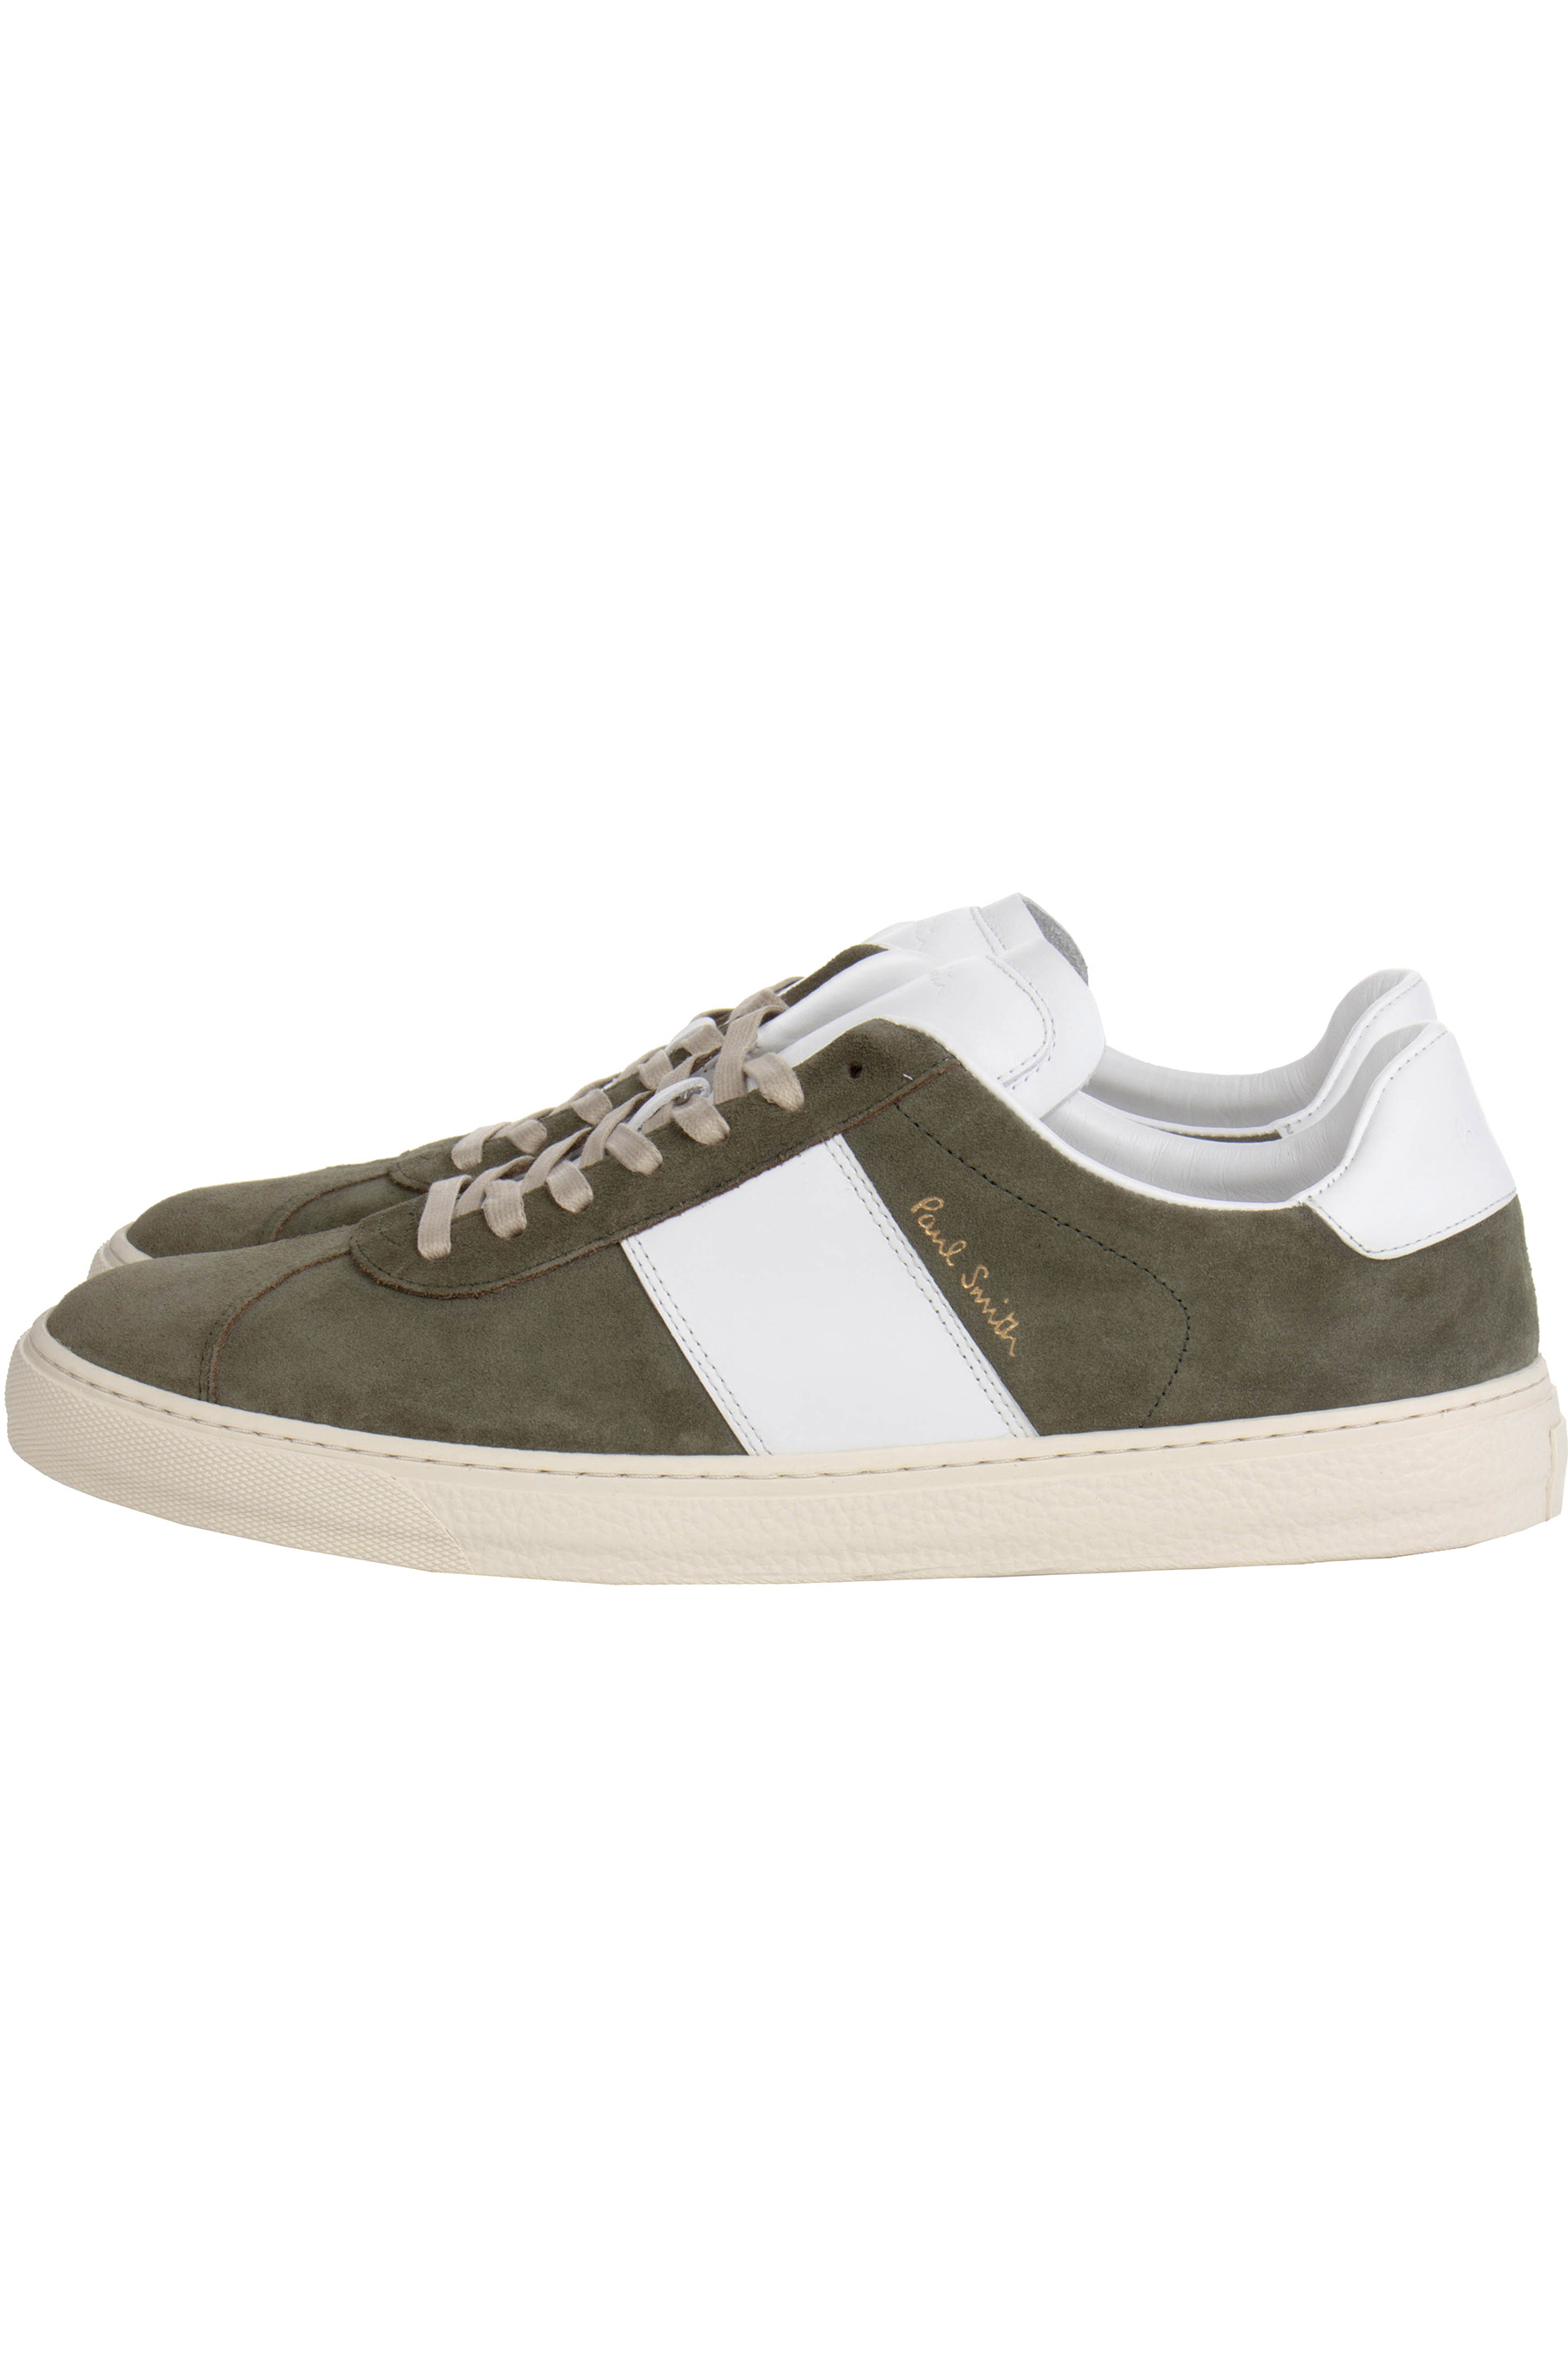 PAUL SMITH Sneakers Levon | Sneakers